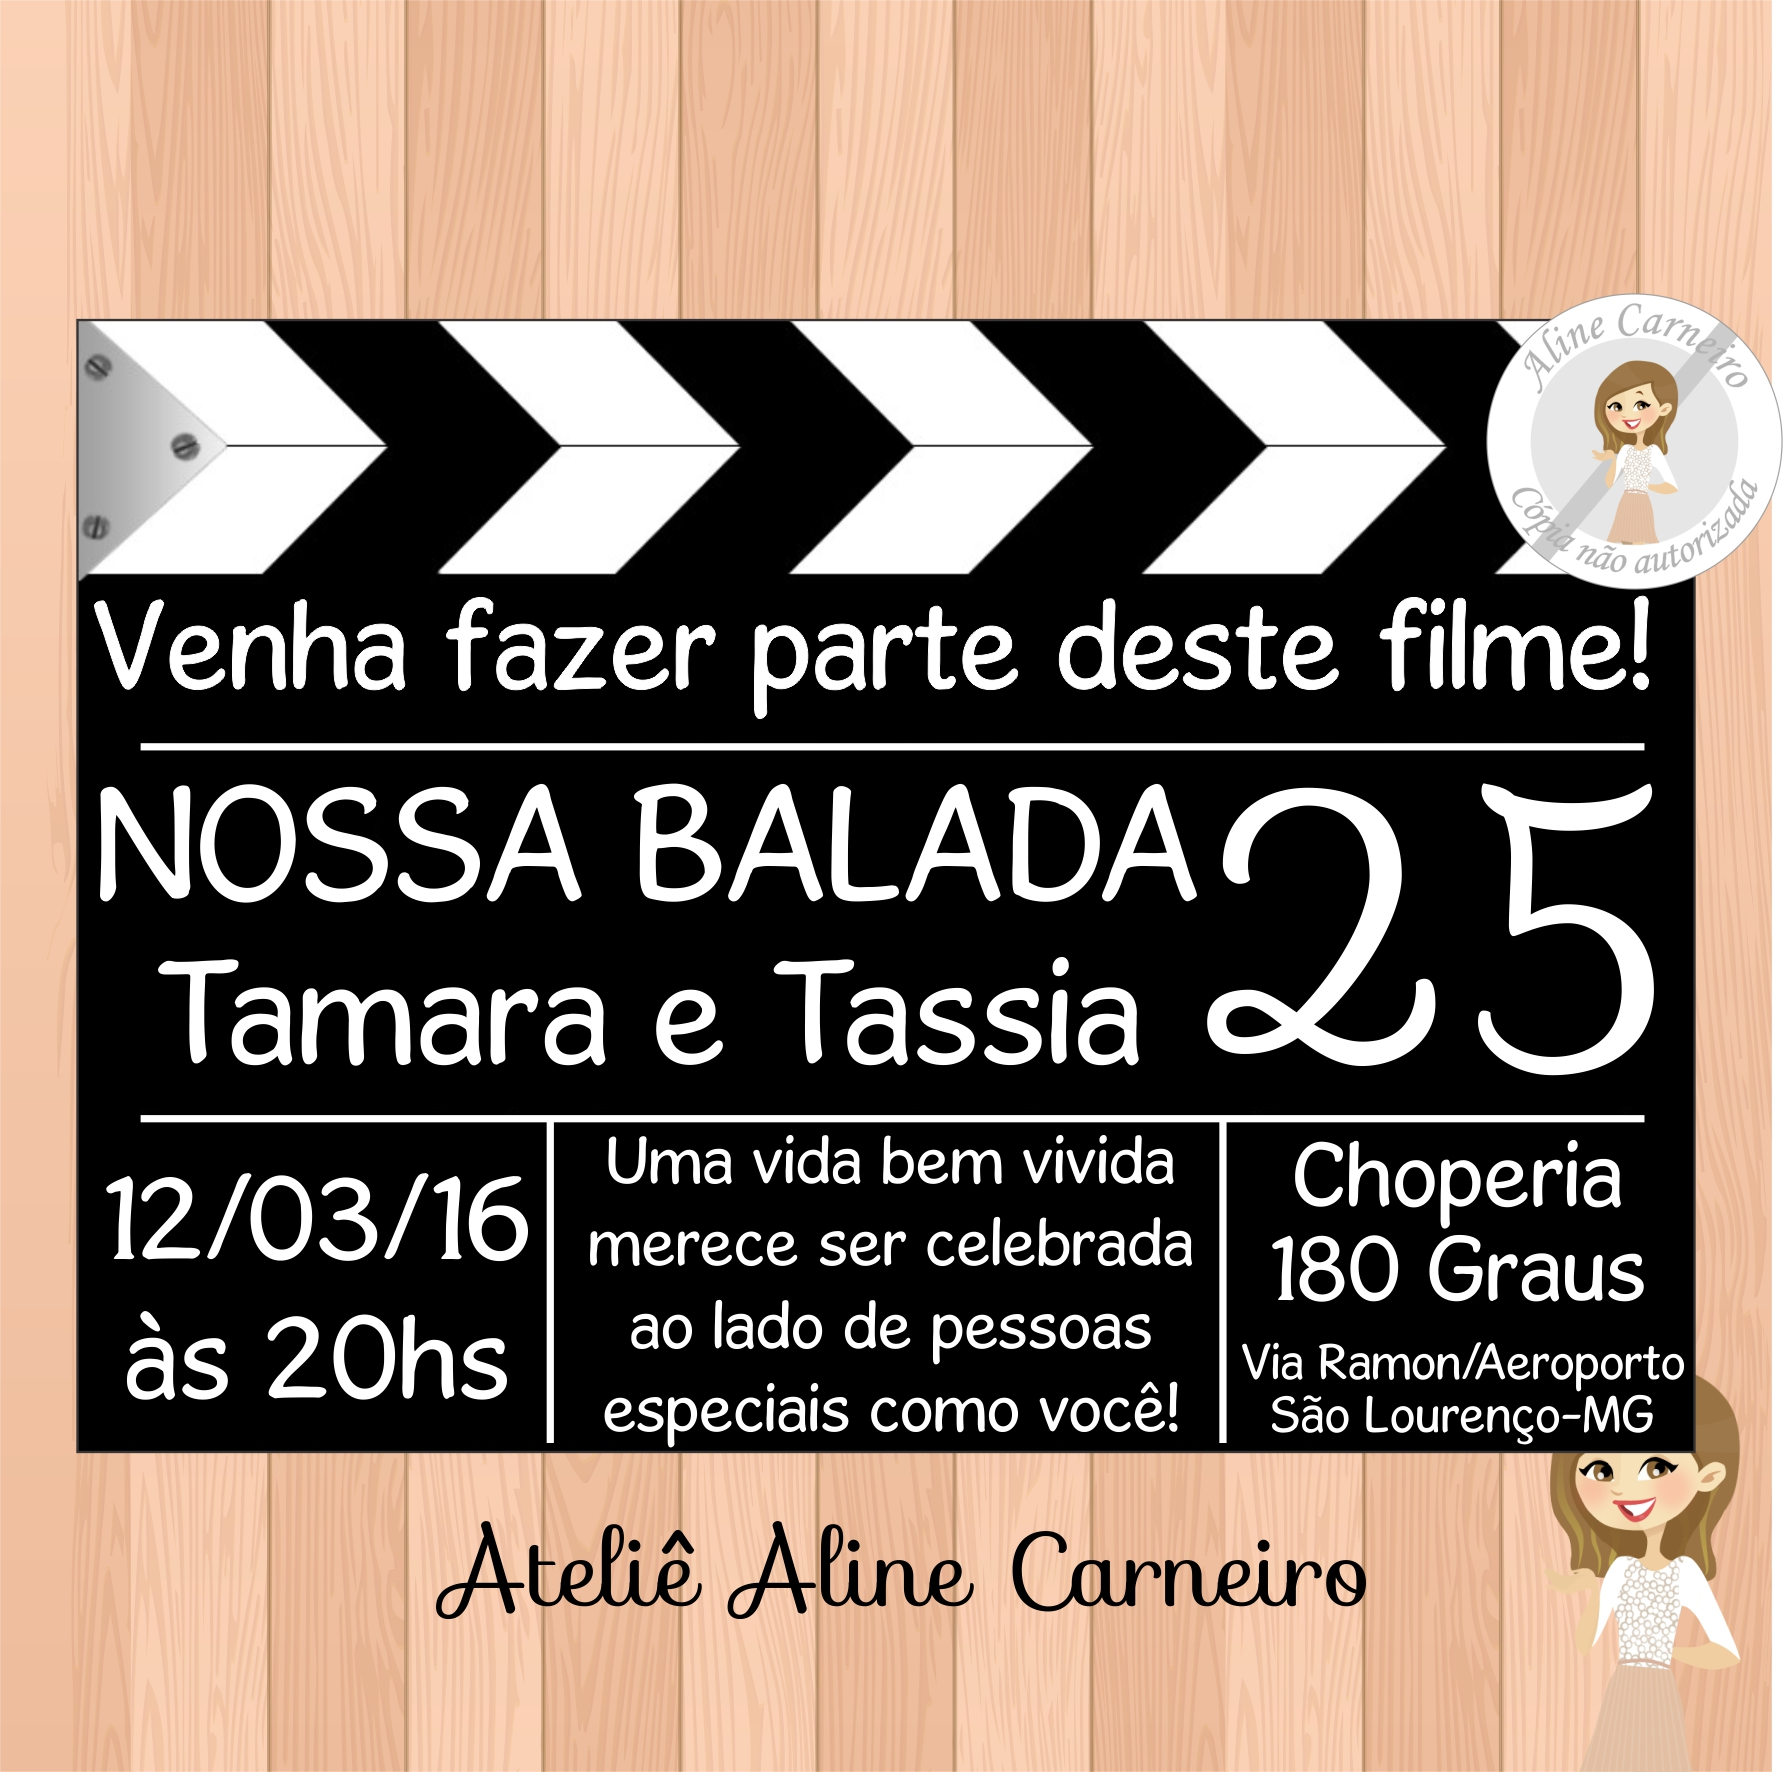 Convite Aniversário Adulto No Elo7 Ateliê Aline Carneiro 448c18